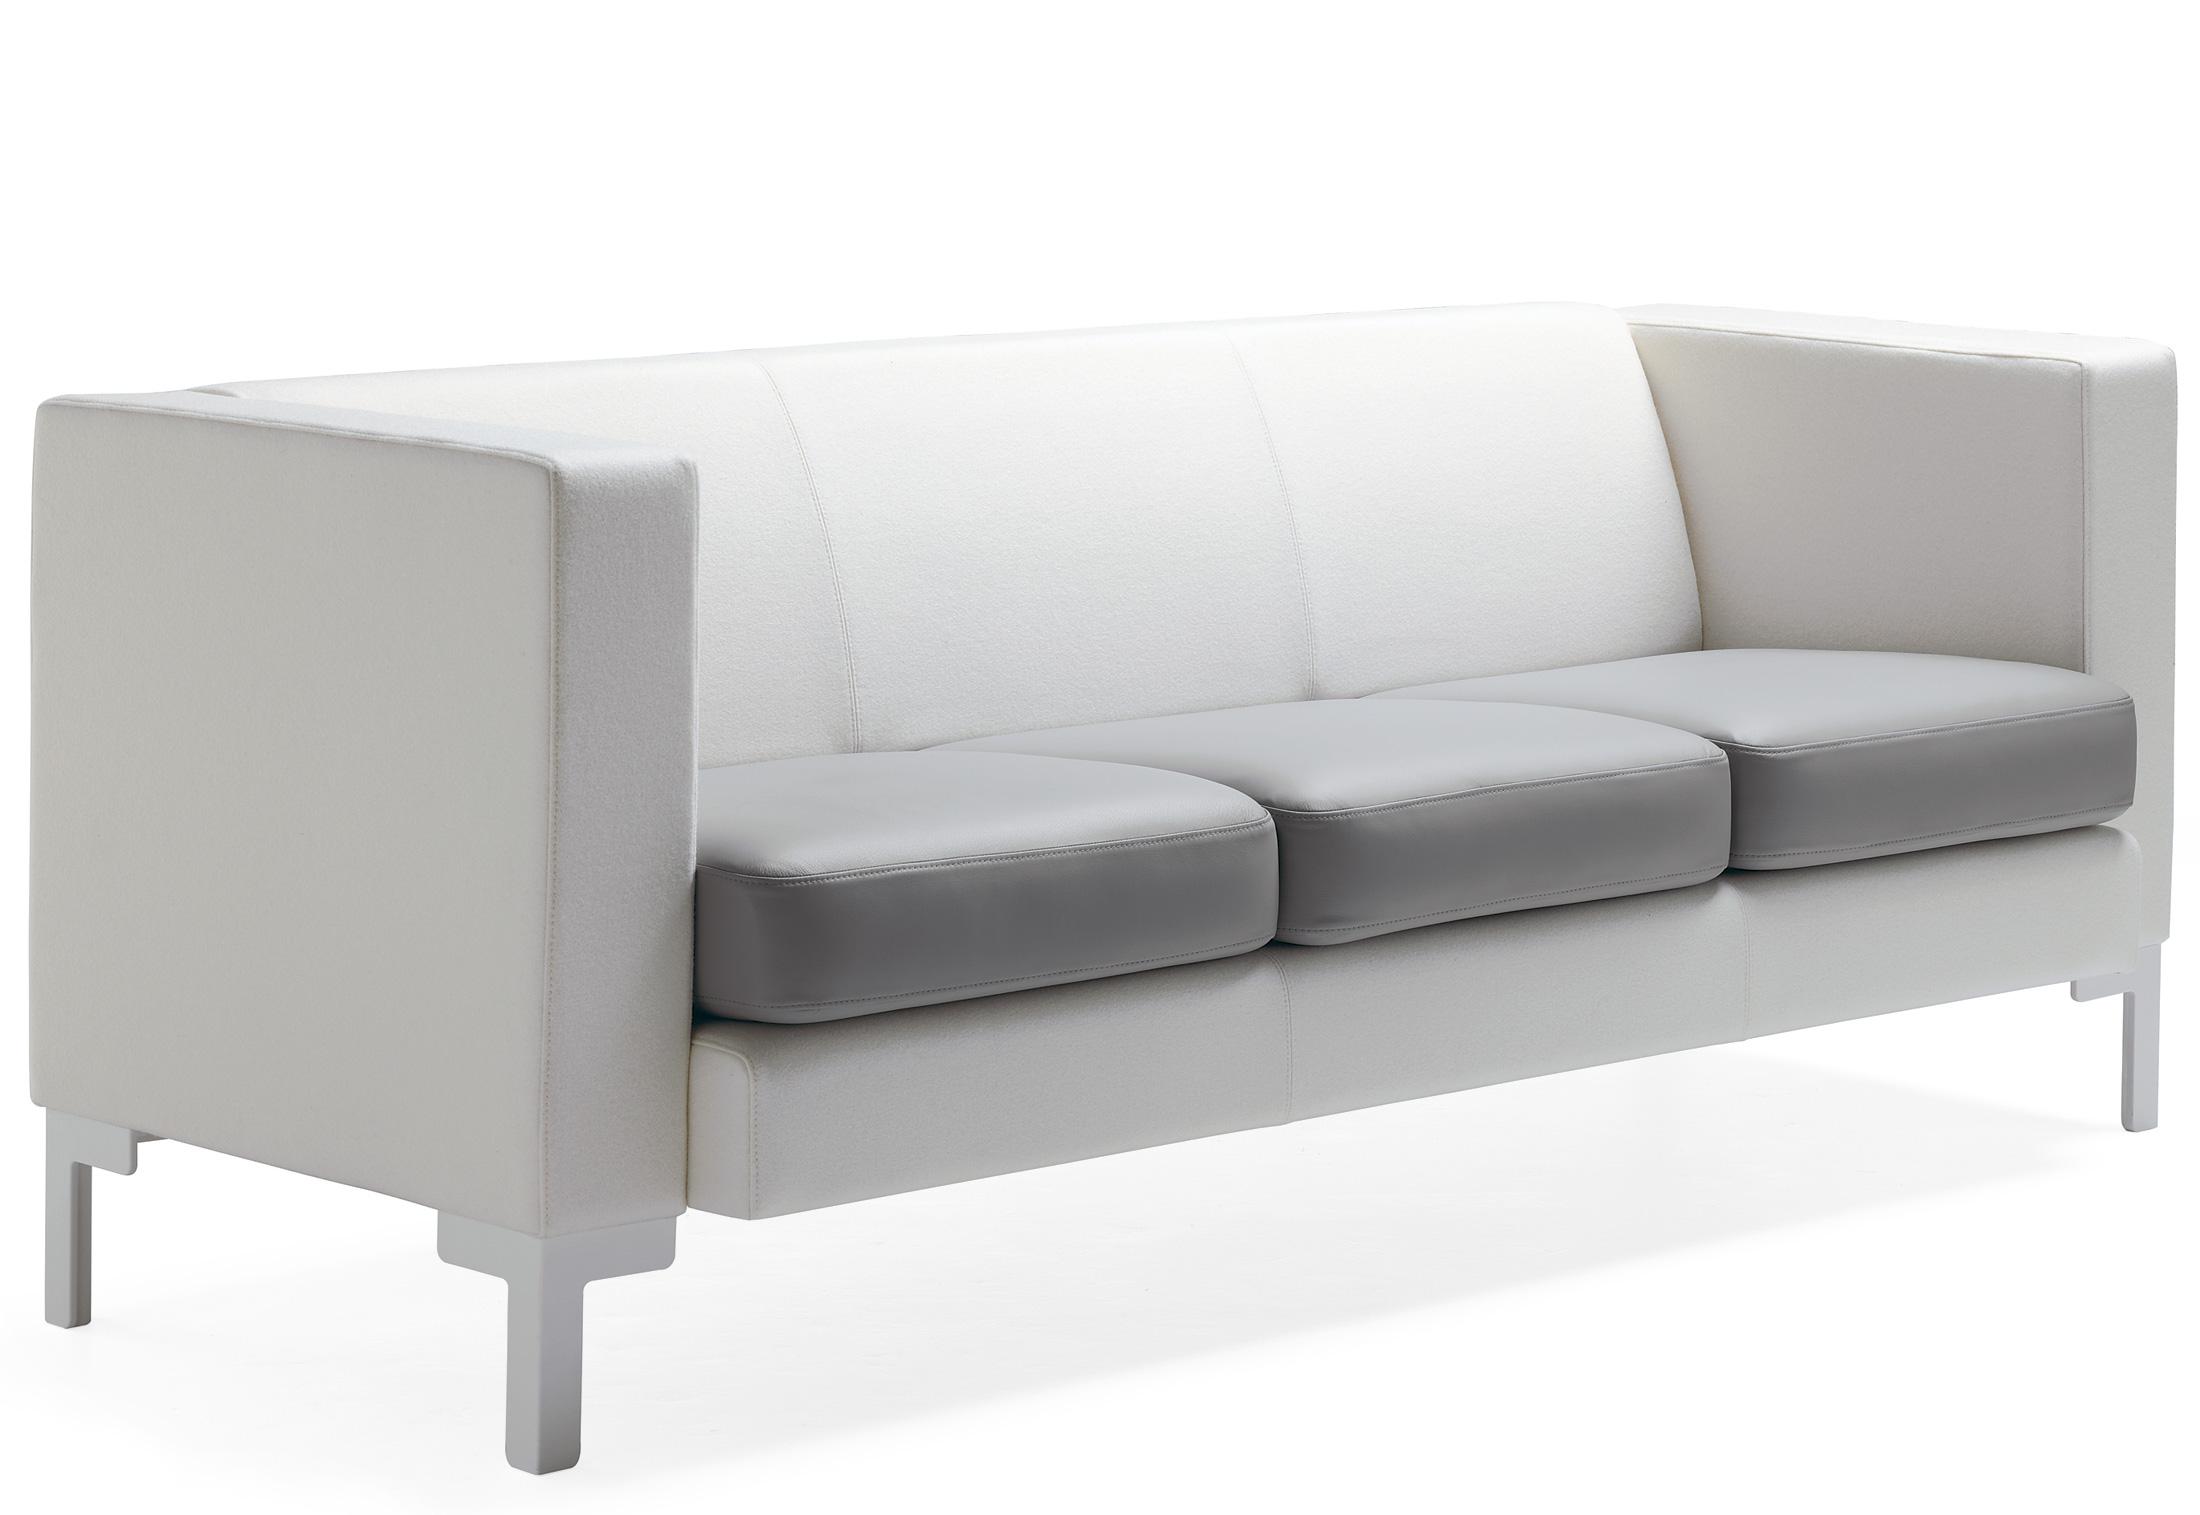 Multi Sofa With Legs; Multi Sofa With Legs ...